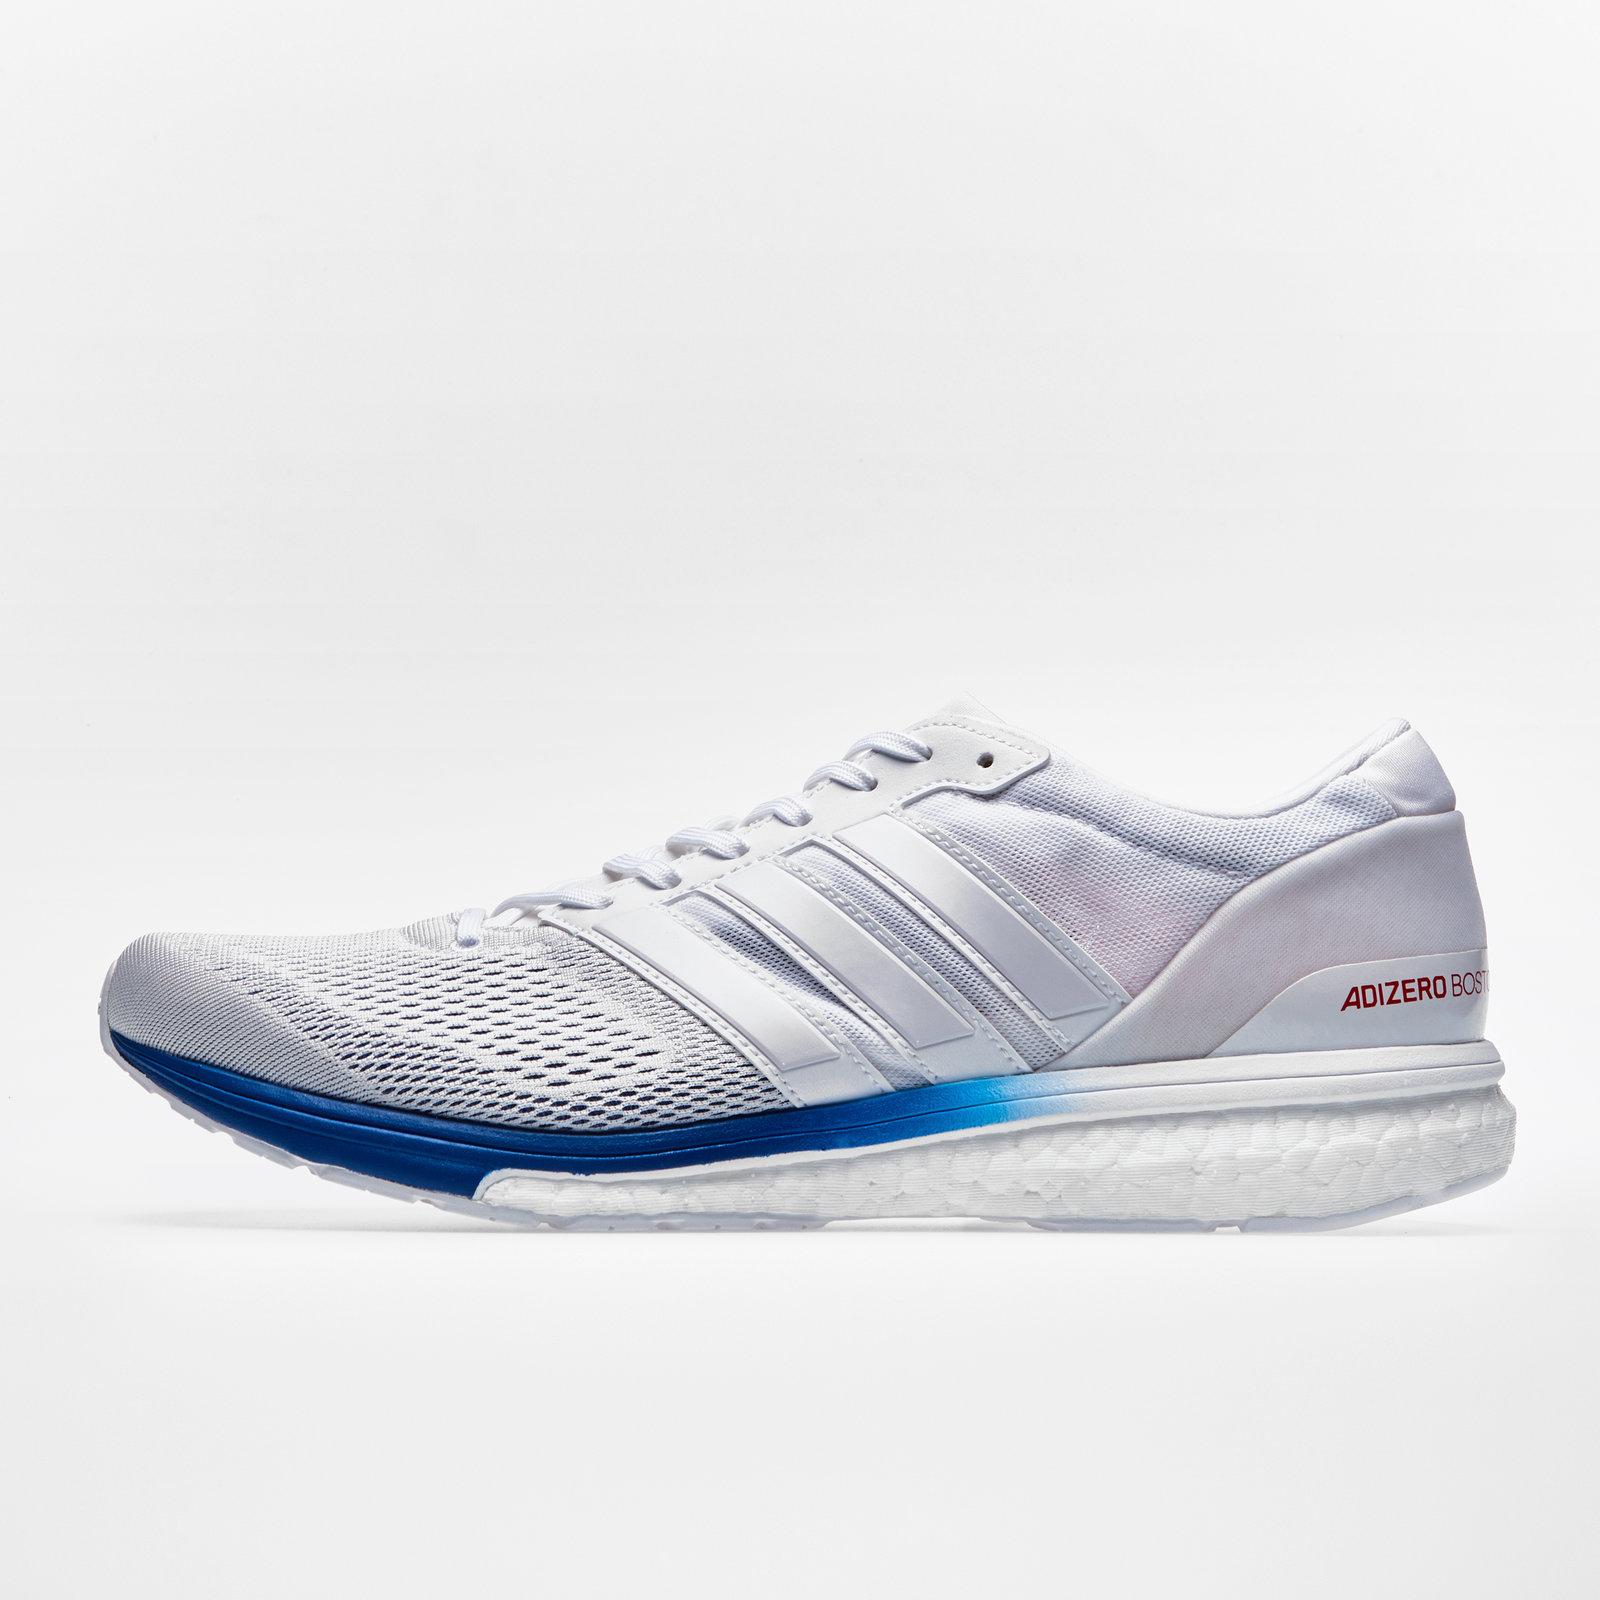 Image of adizero Boston 6 AKTIV Mens Running Shoes